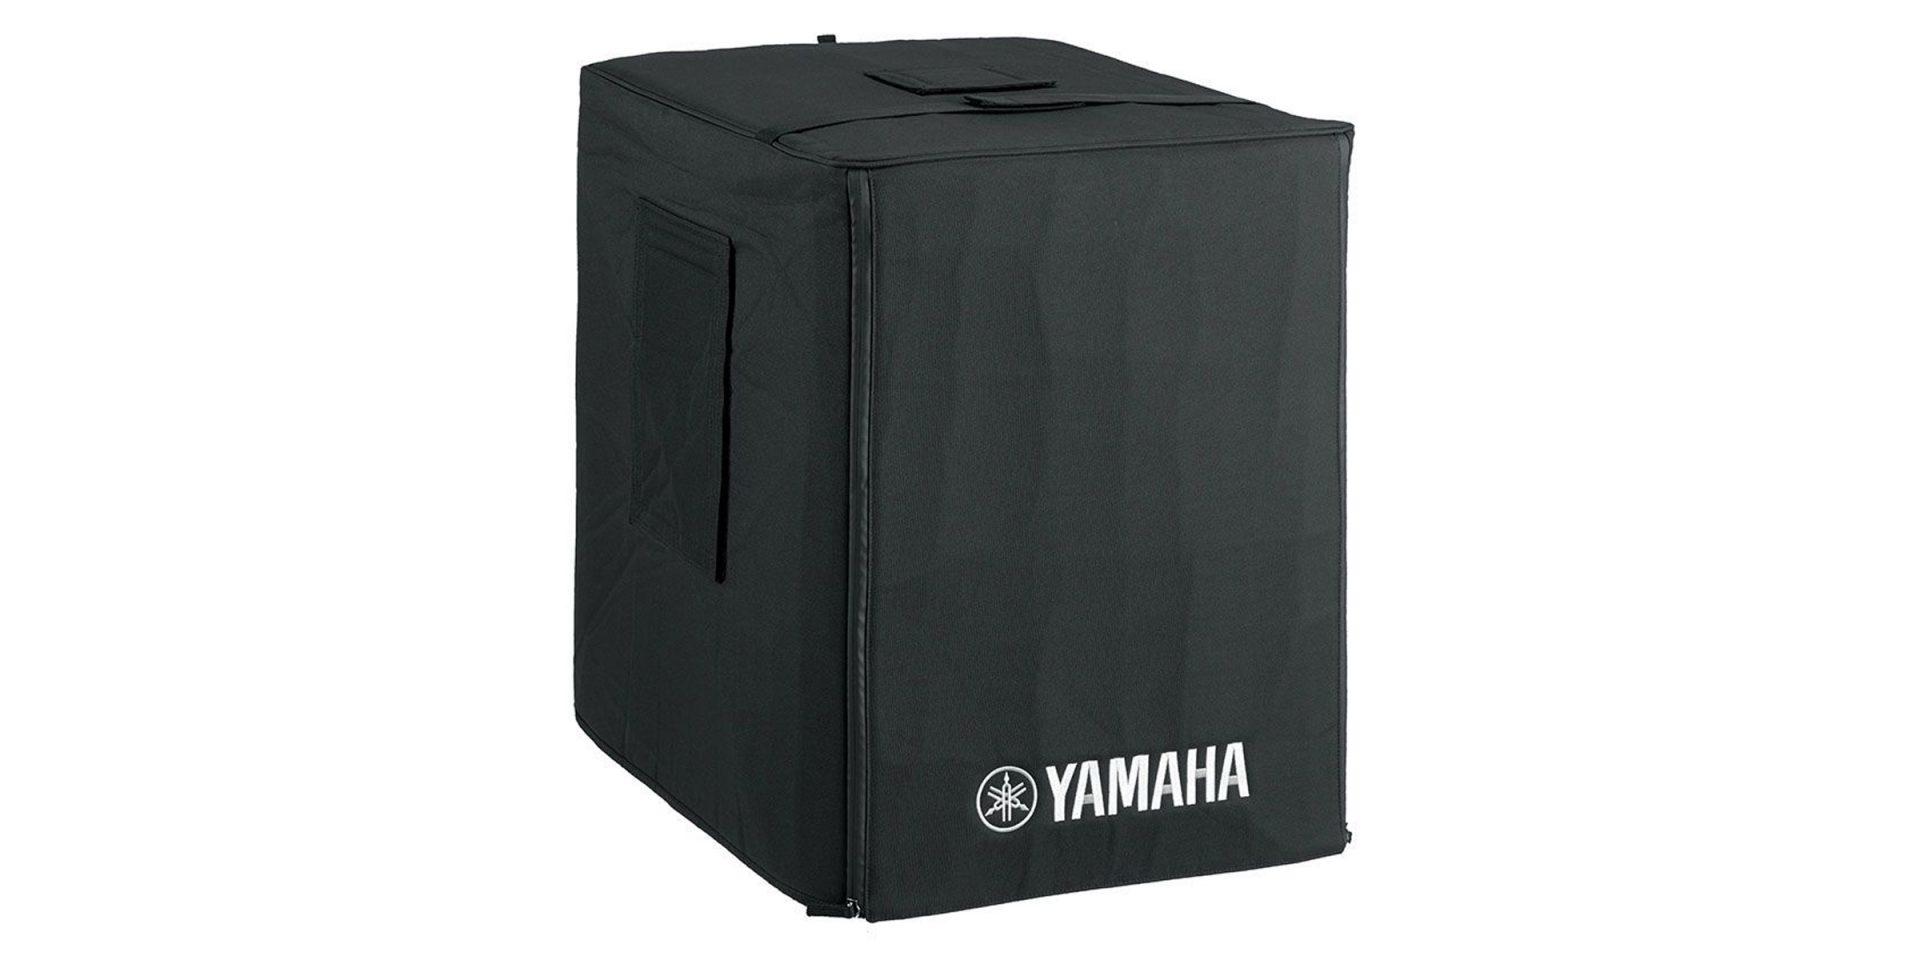 Yamaha SPCVR15S01